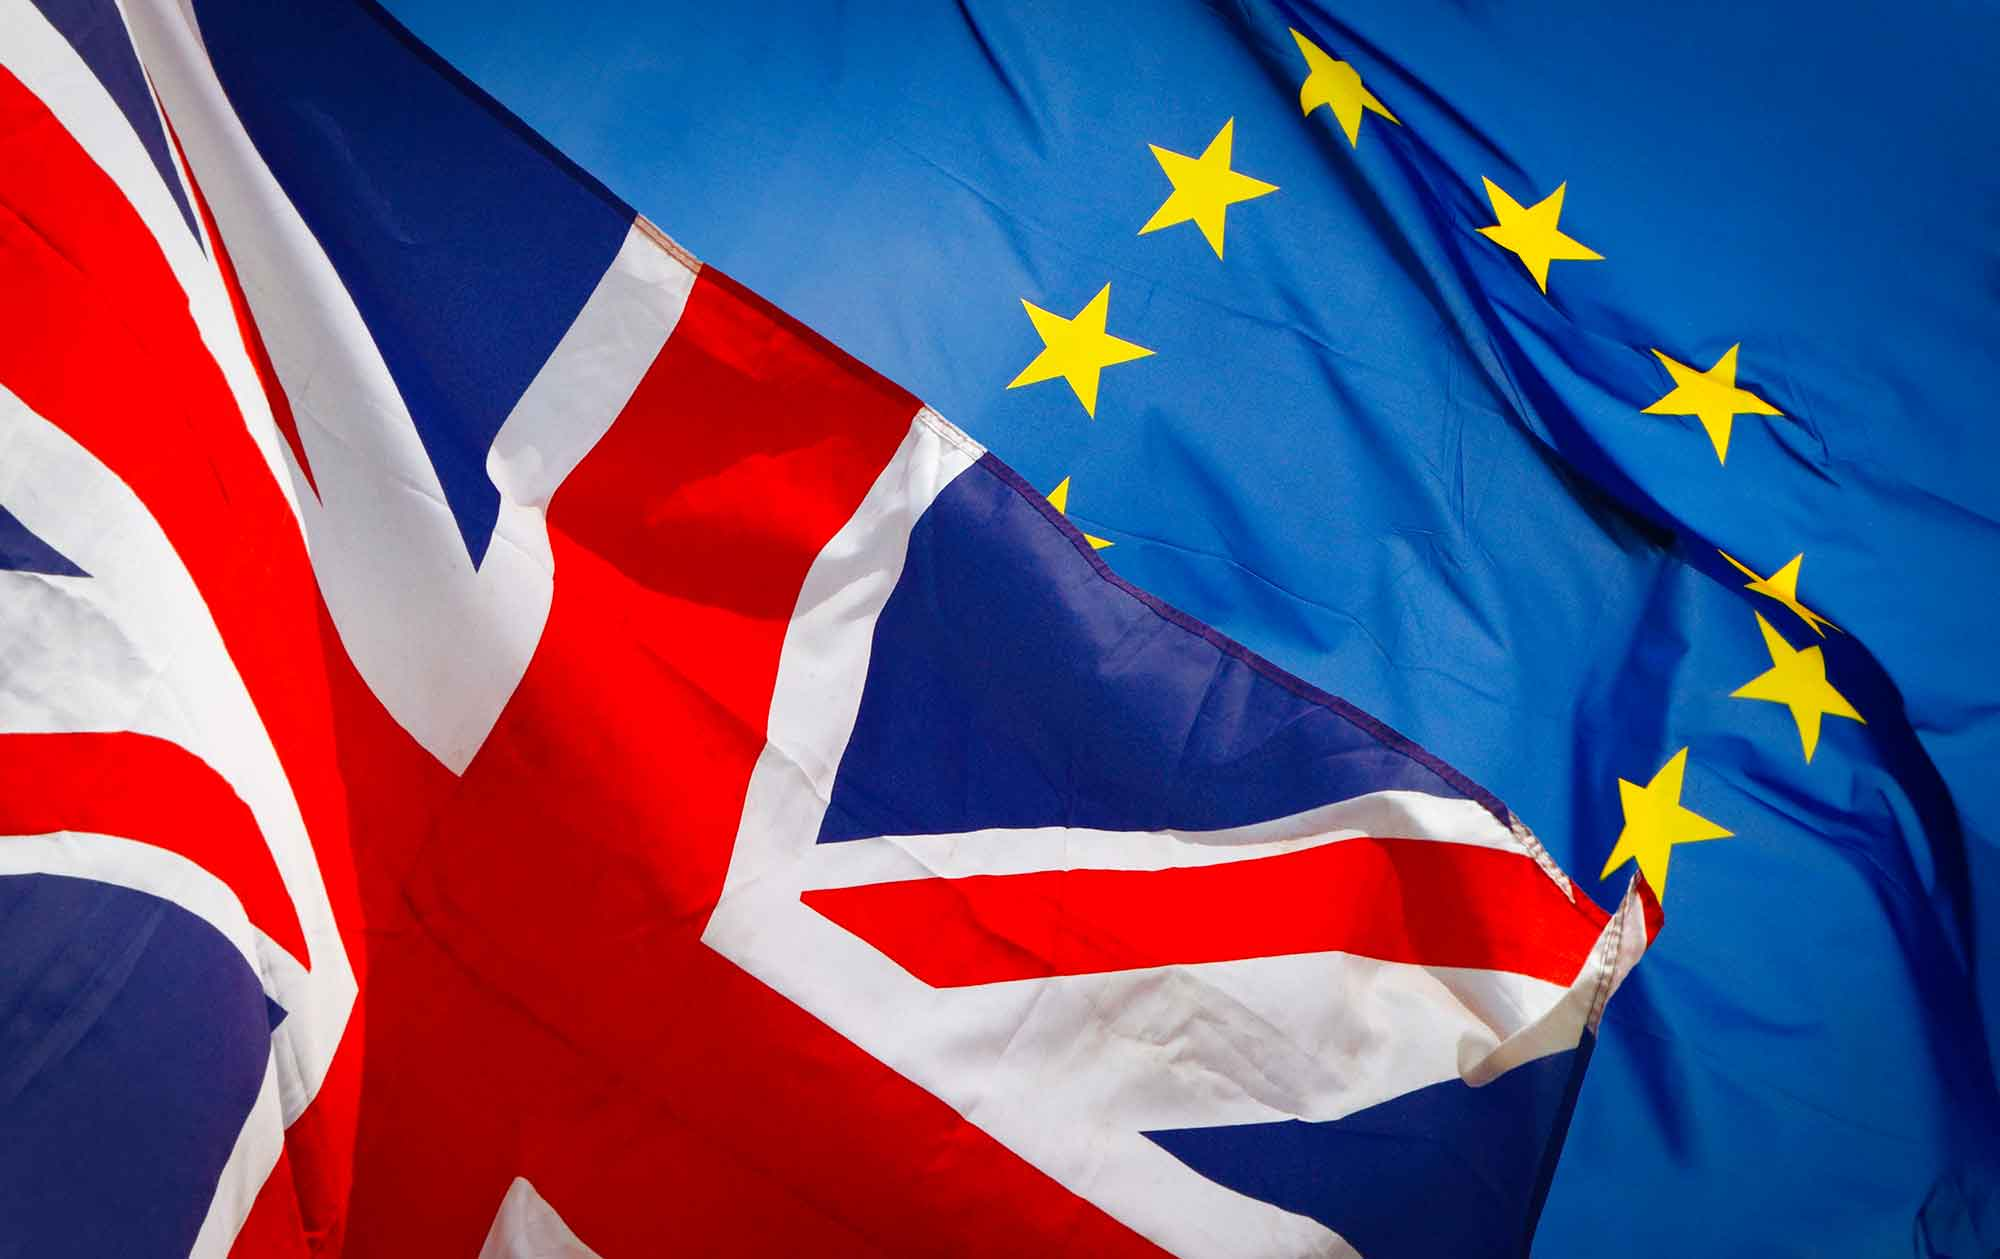 brexit-flags-large